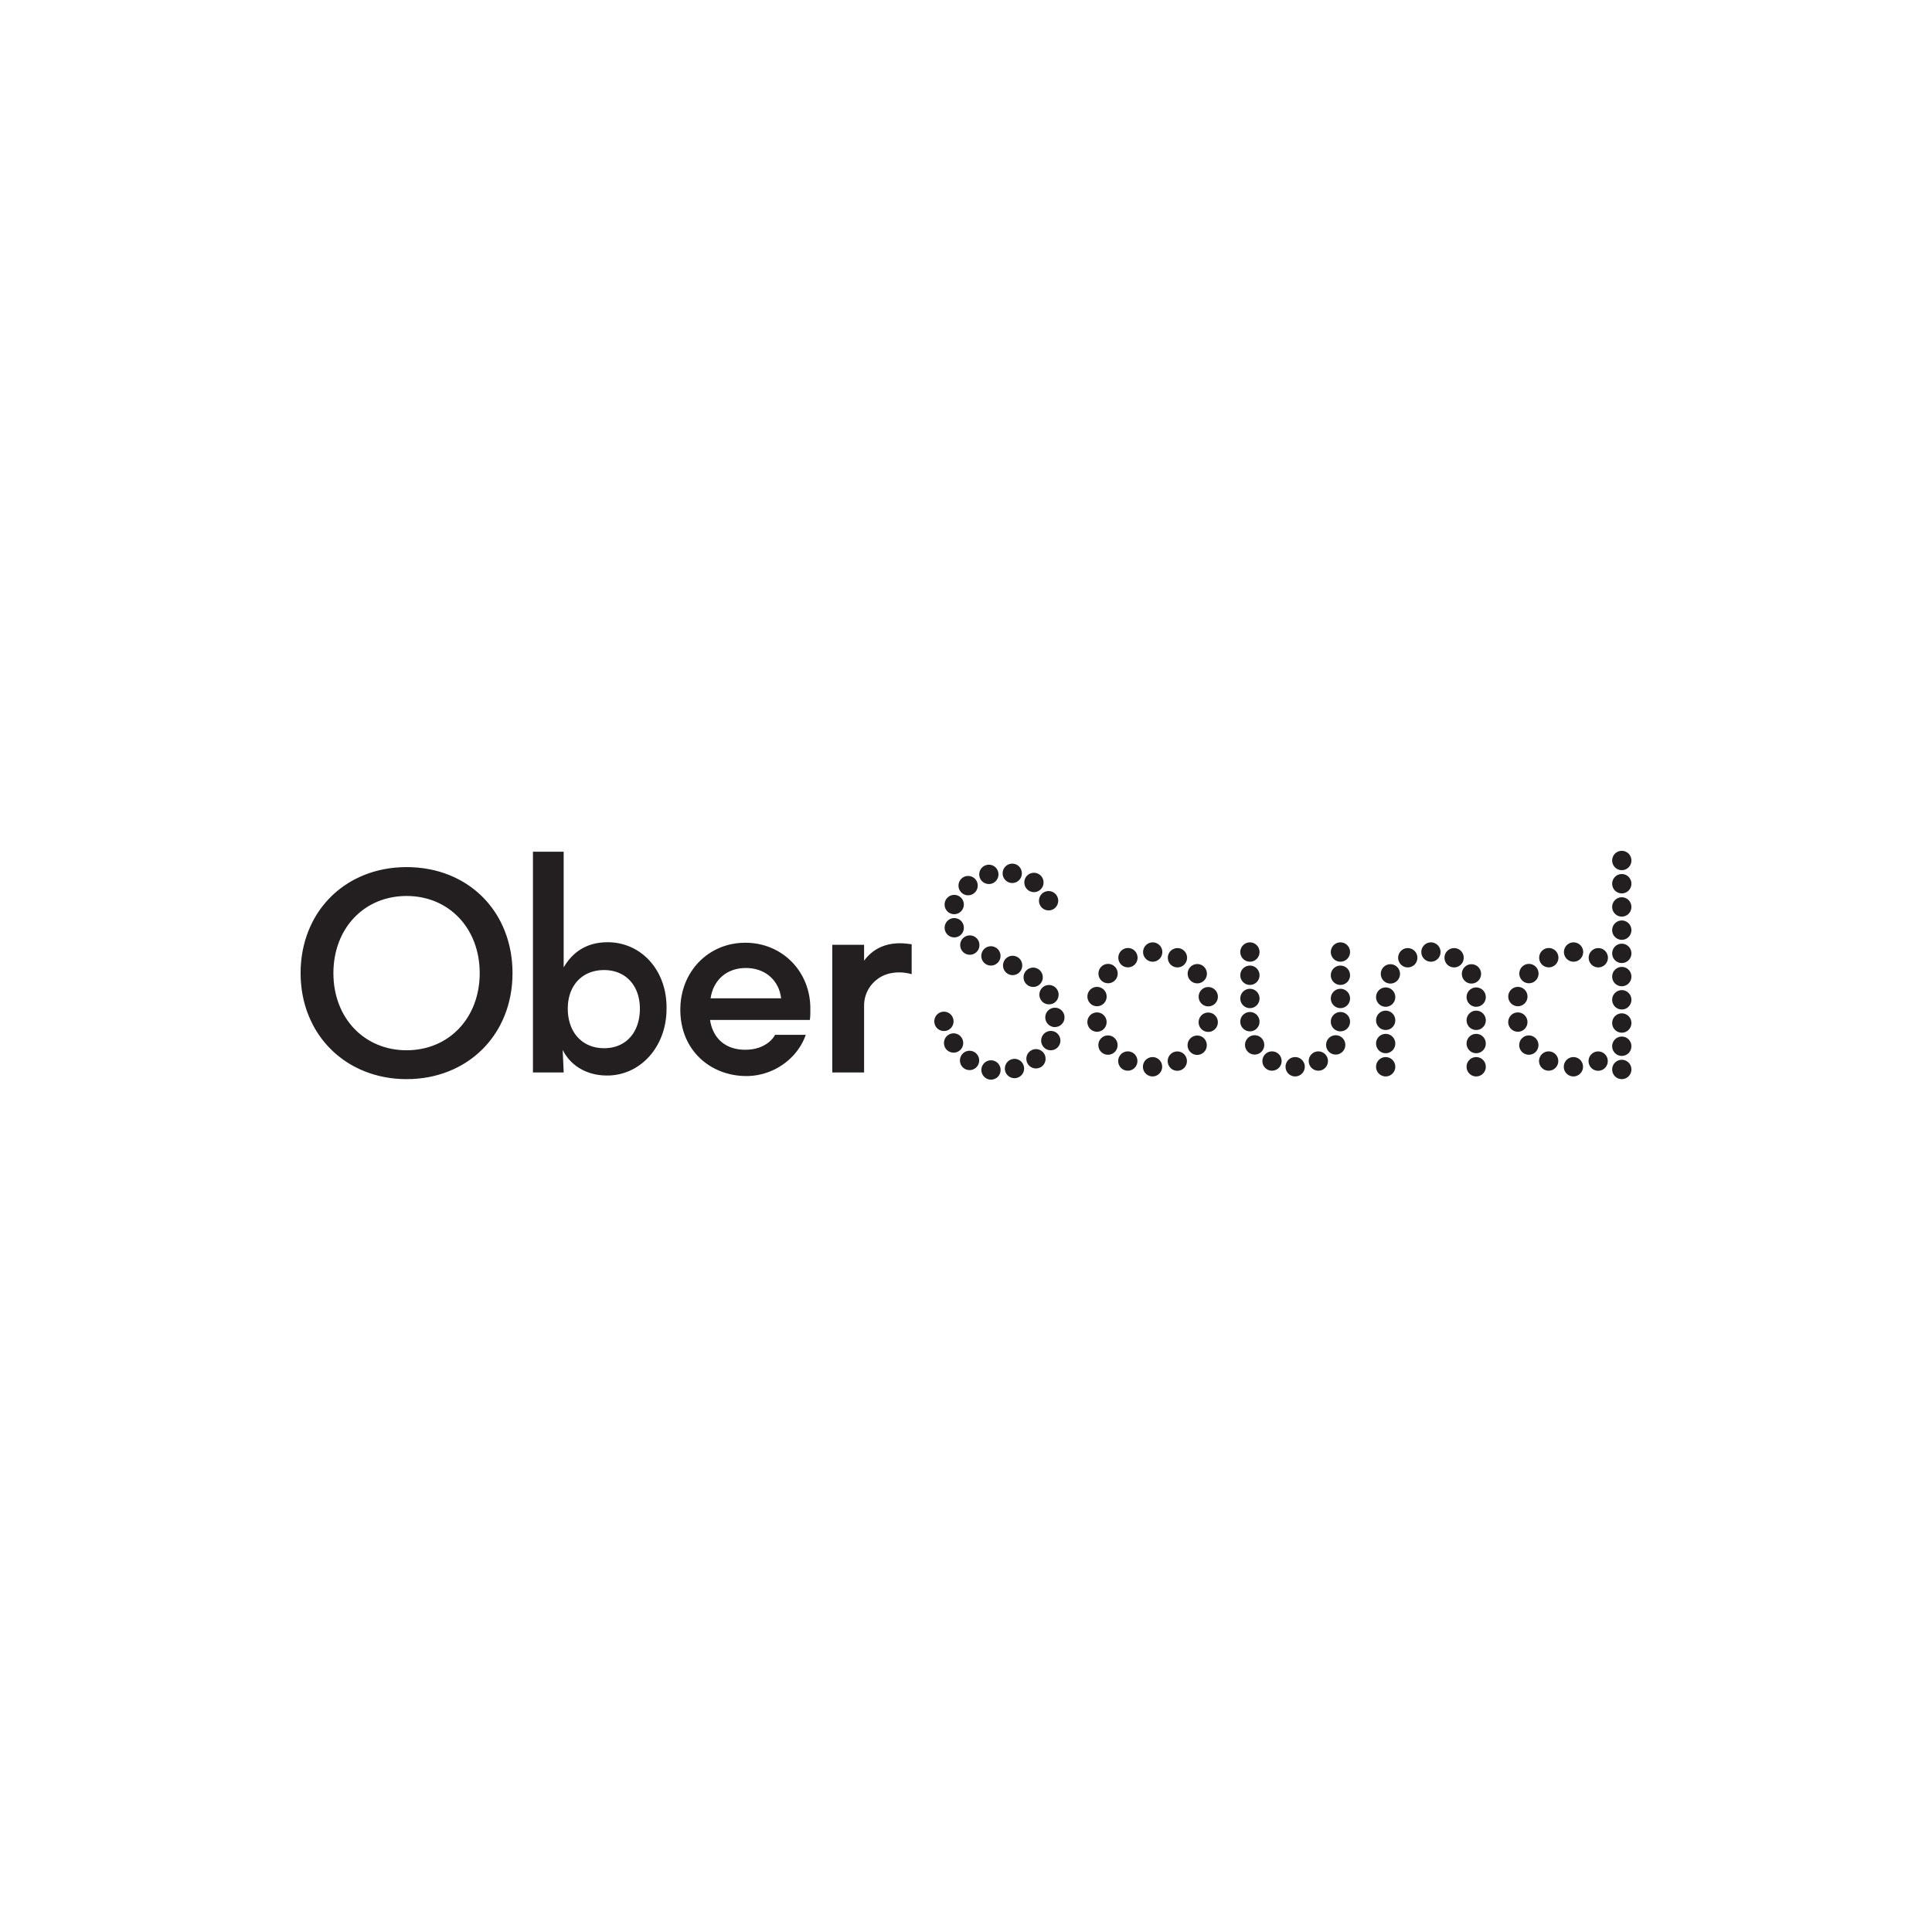 obersound-logo.jpg